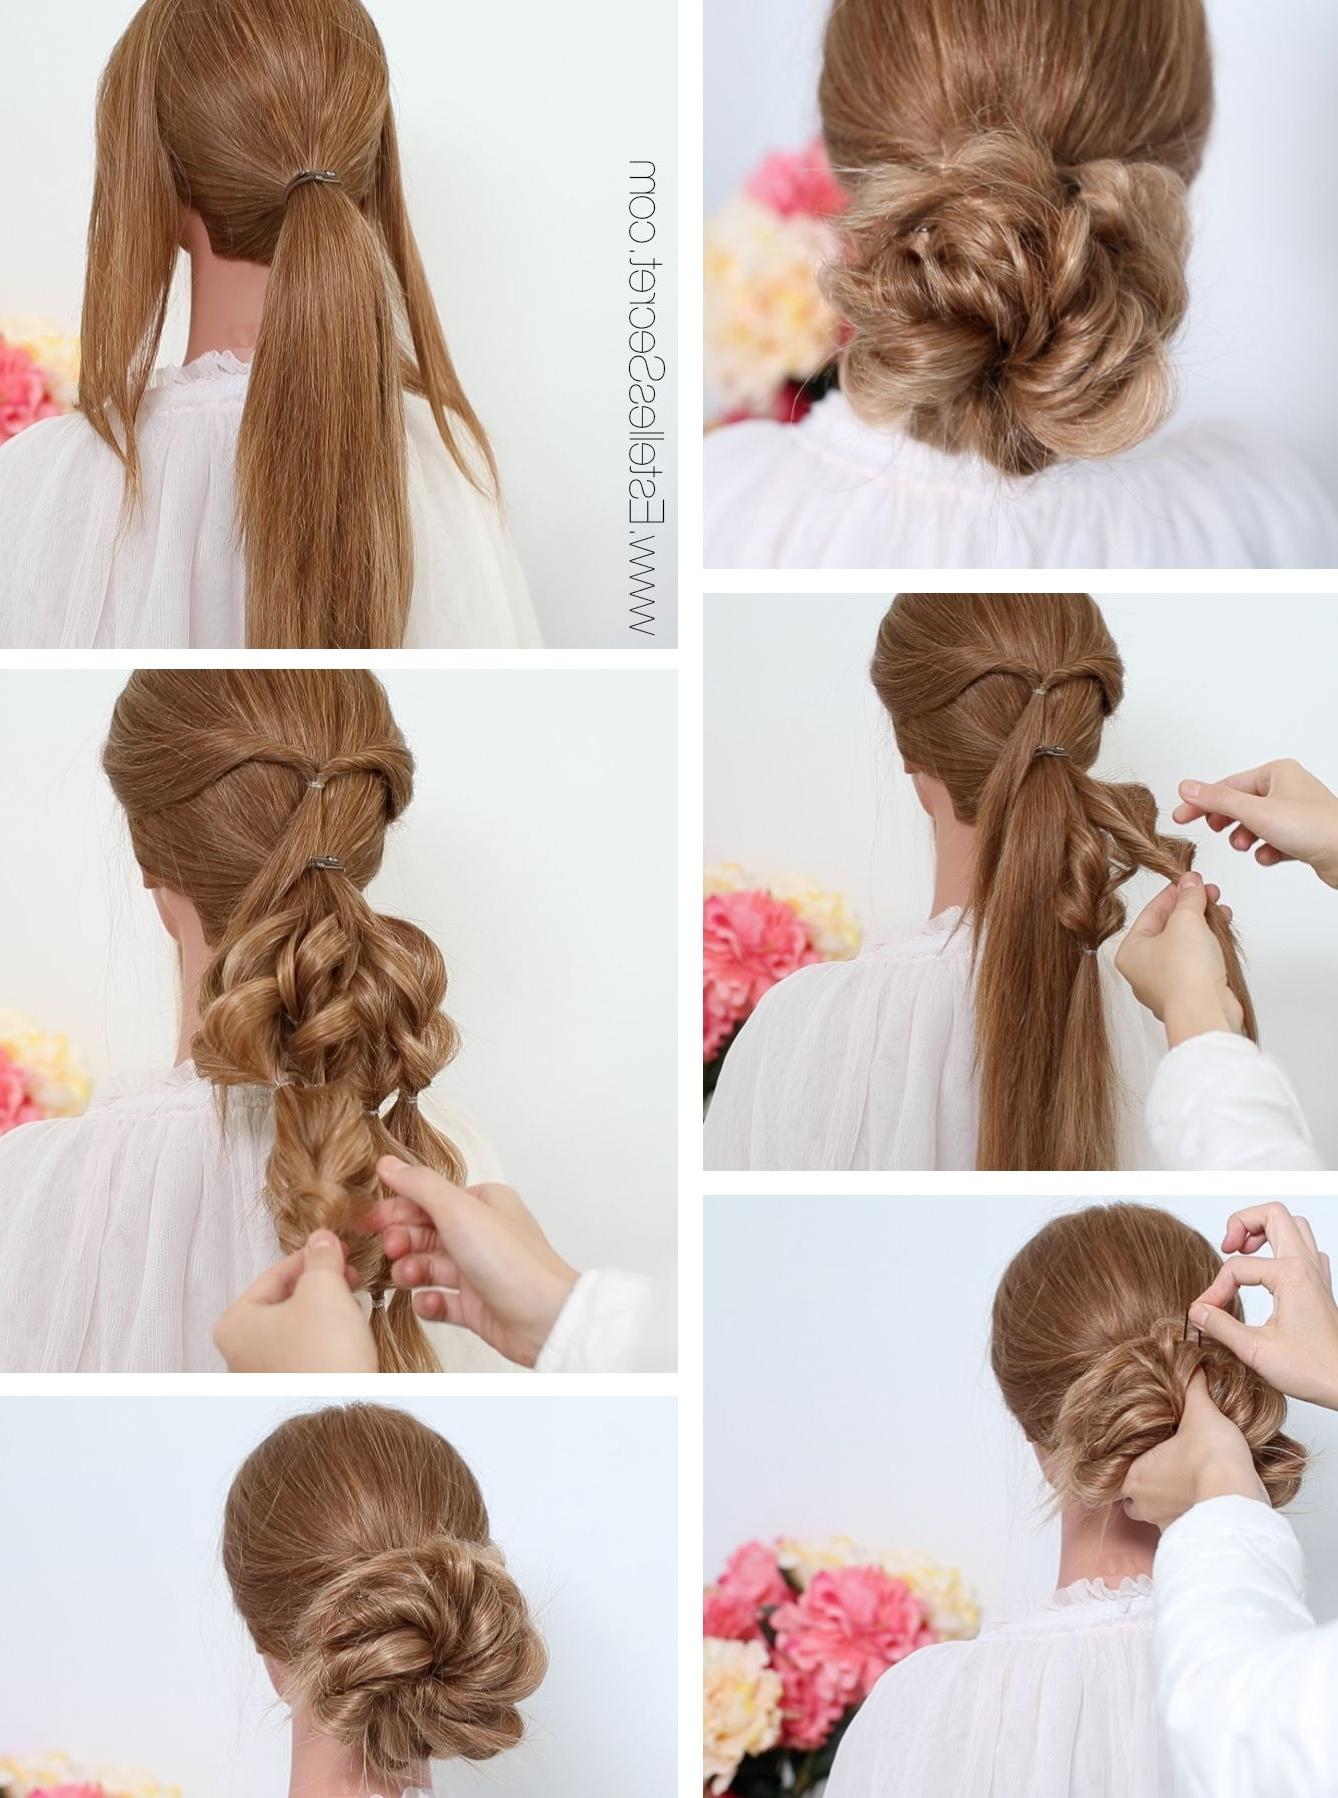 Bridal Low Bun Hairstyle Using Estelles Secret Hair Extensions (View 3 of 15)